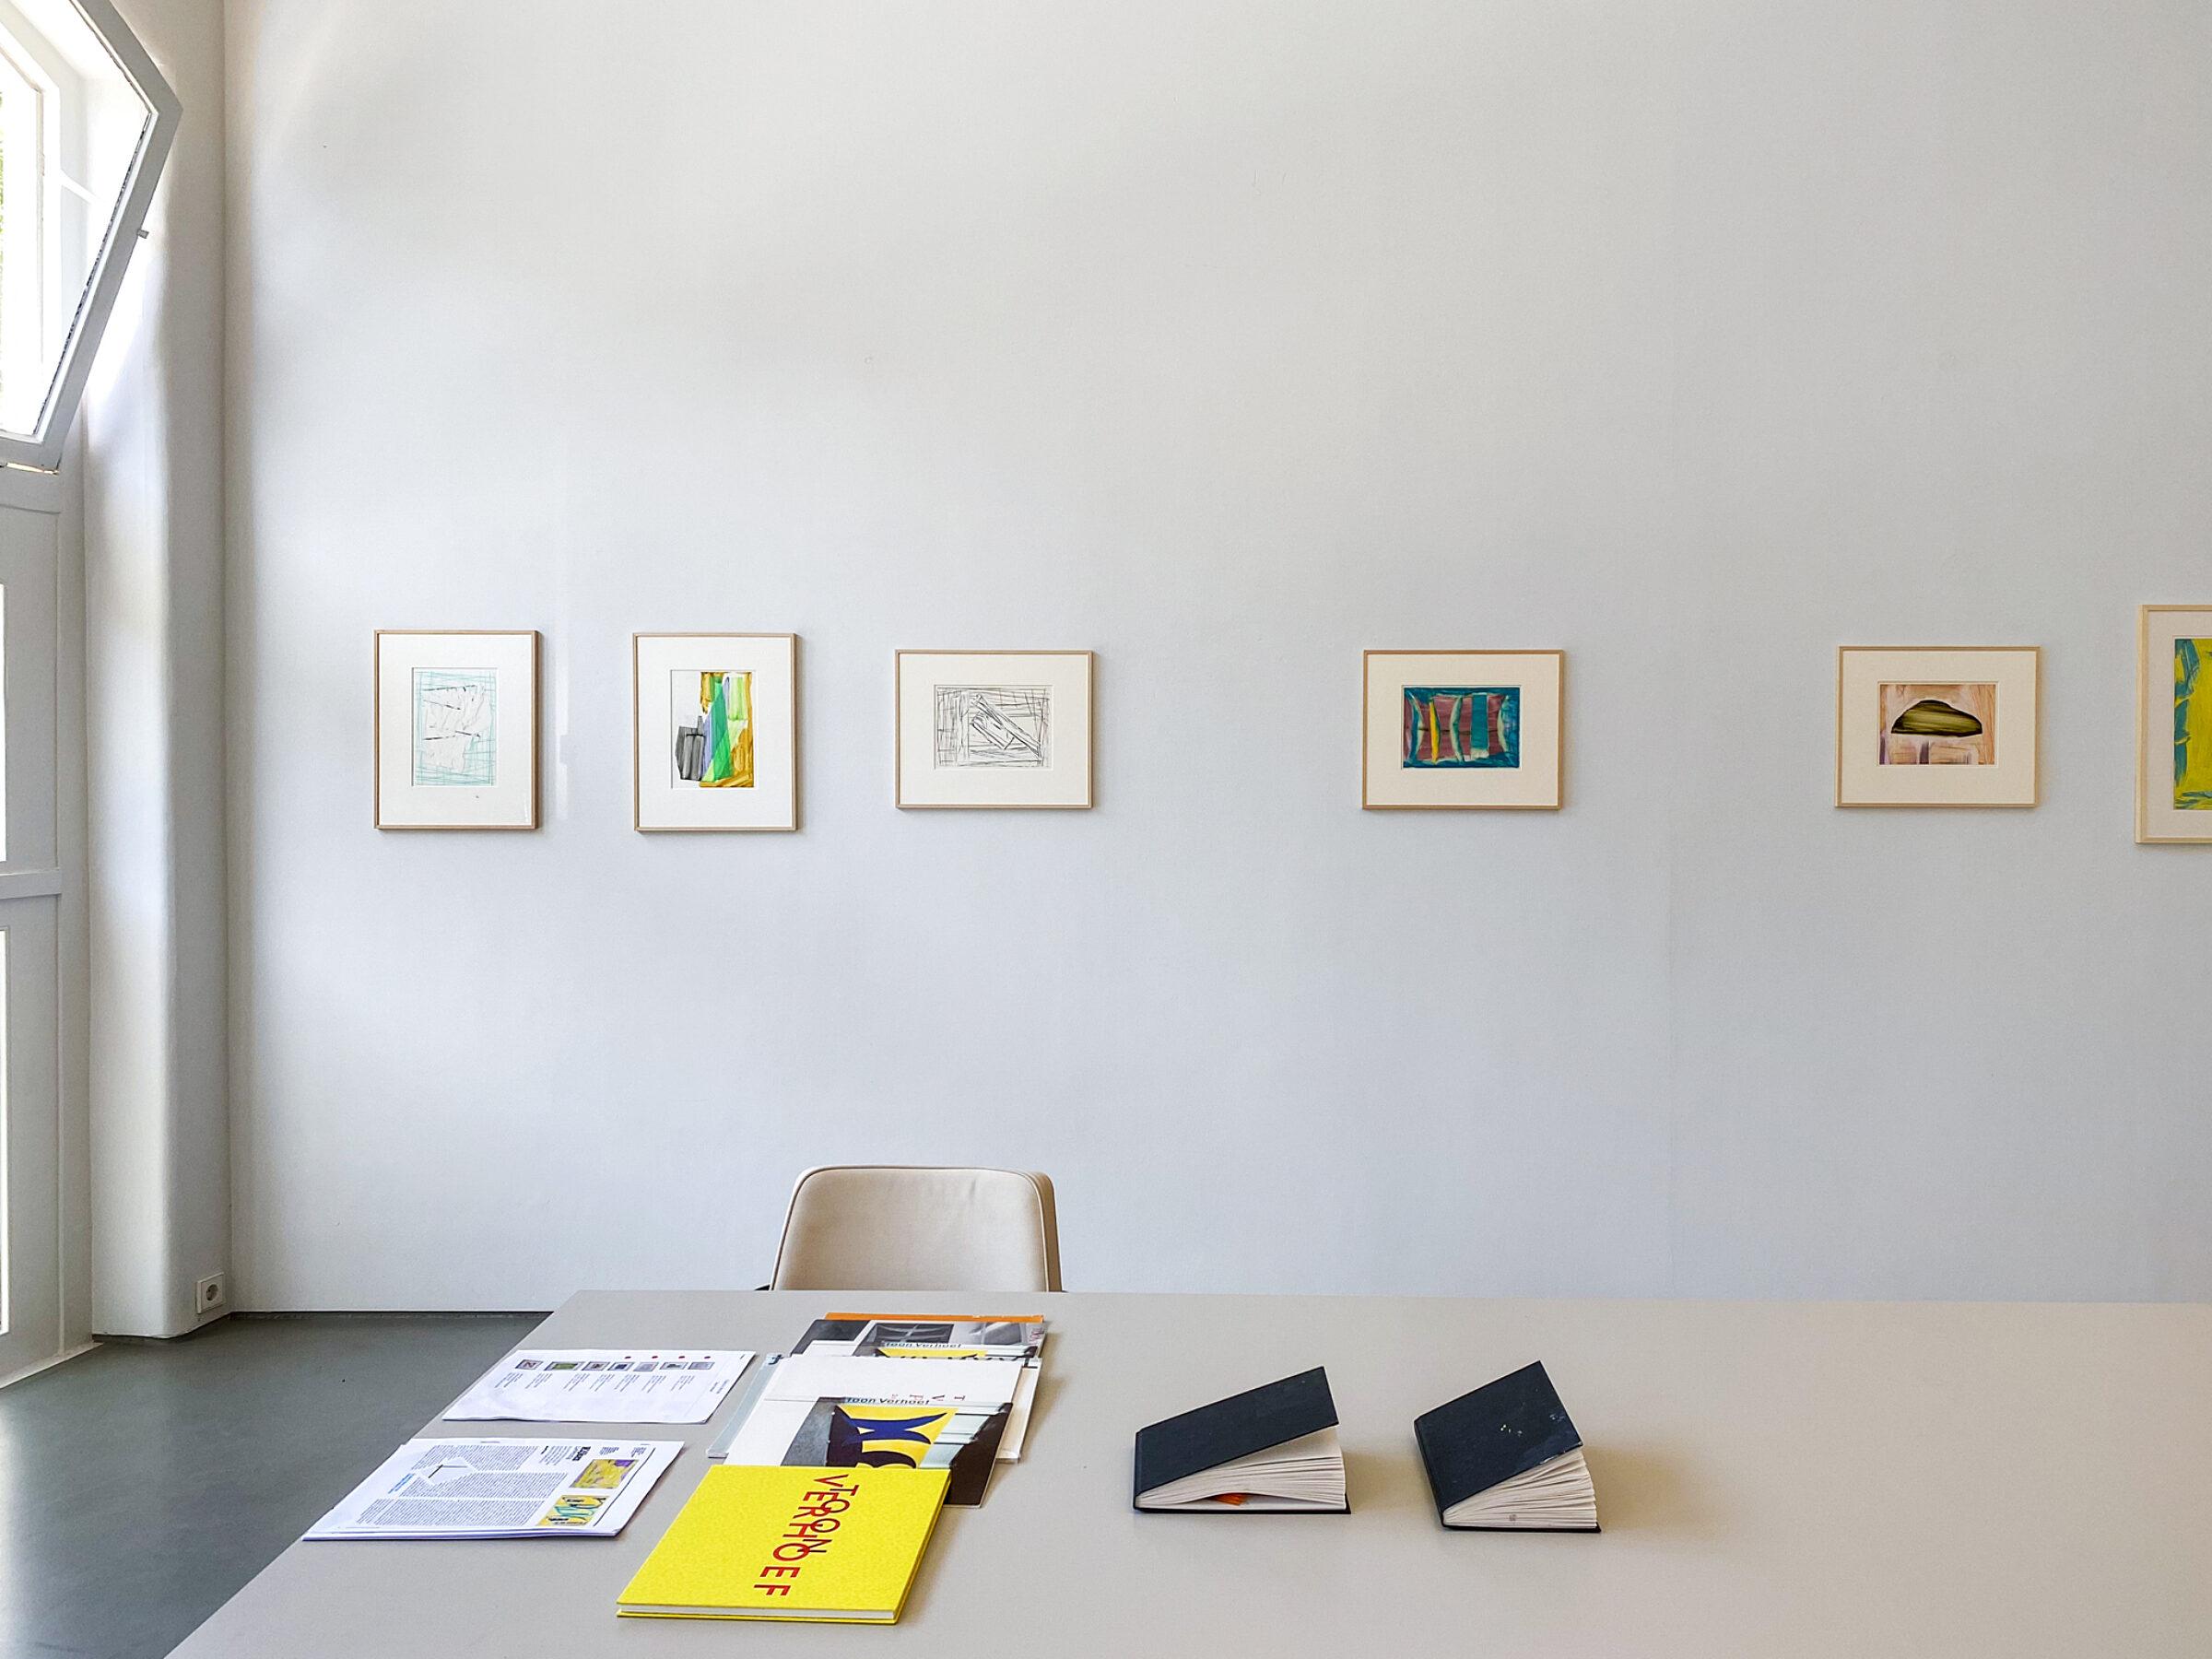 Toon-Verhoef-Galerie-Onrust-EX-2020_laboratory_01.jpg